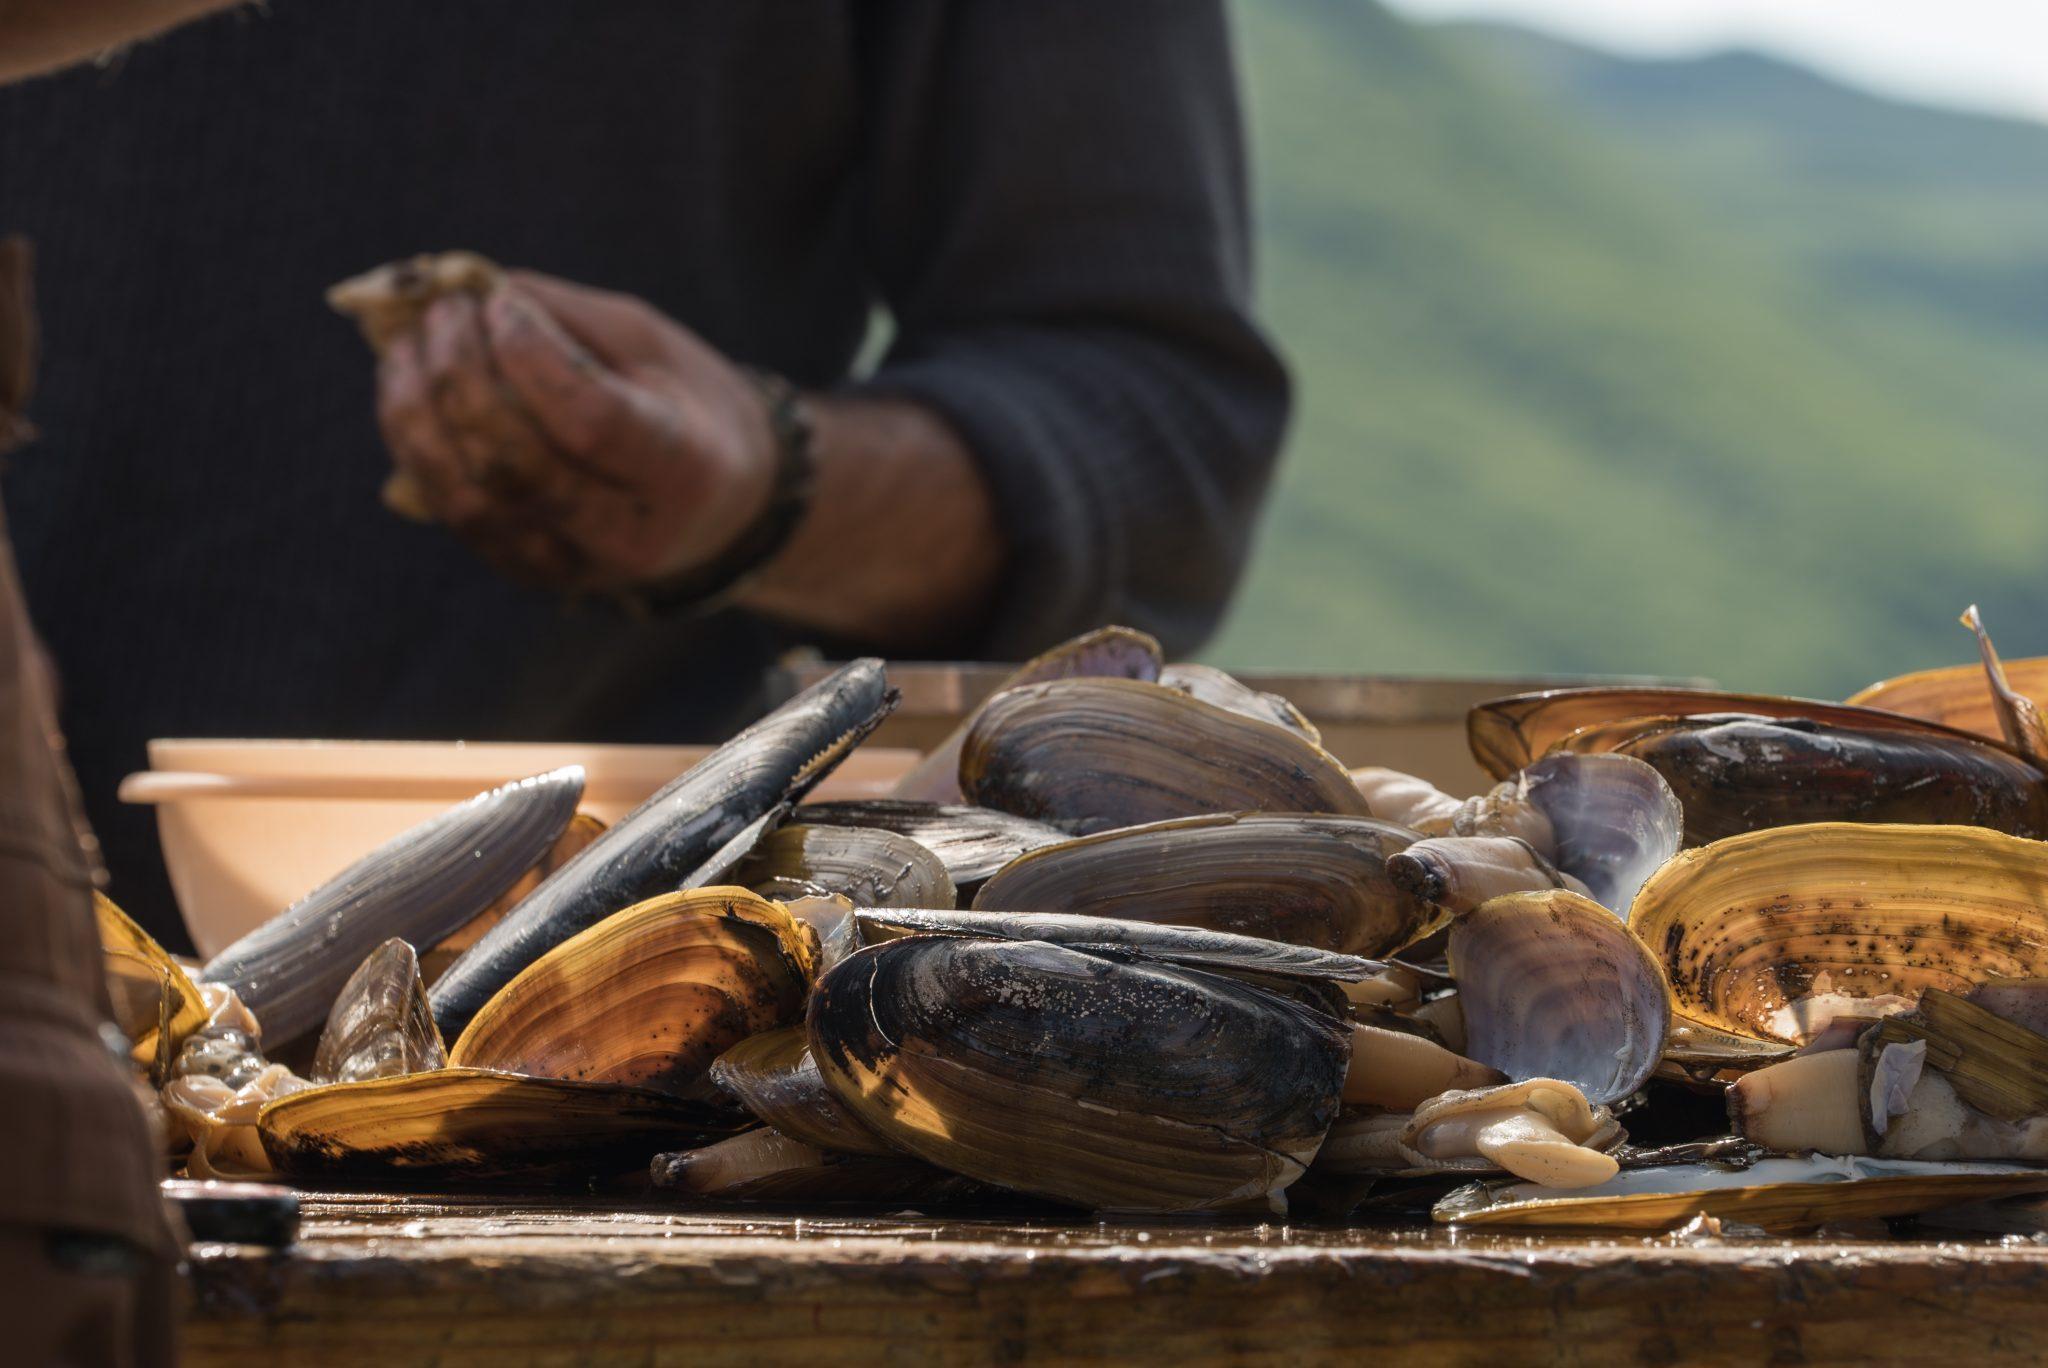 alaska-clamming-razor-clams-snug-harbor-DSC06692